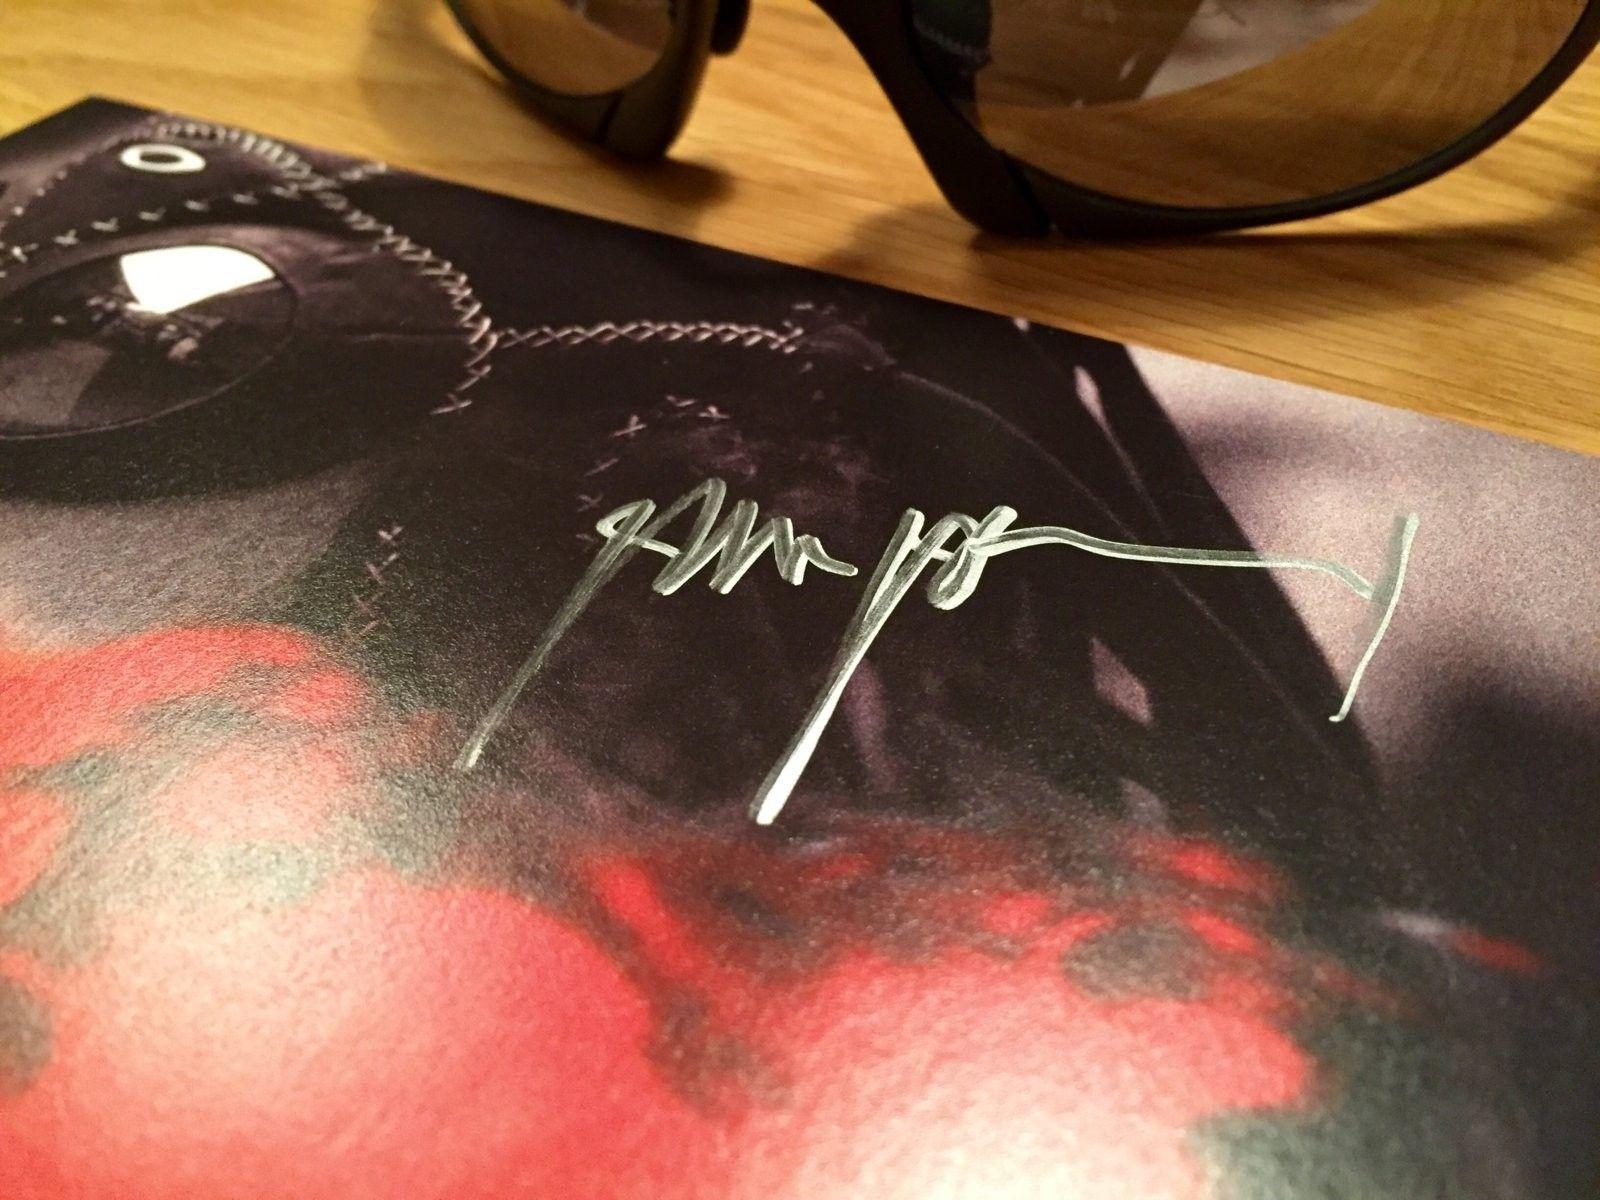 Medusa pop card signed by Jim Jannard - impossible - image.jpeg